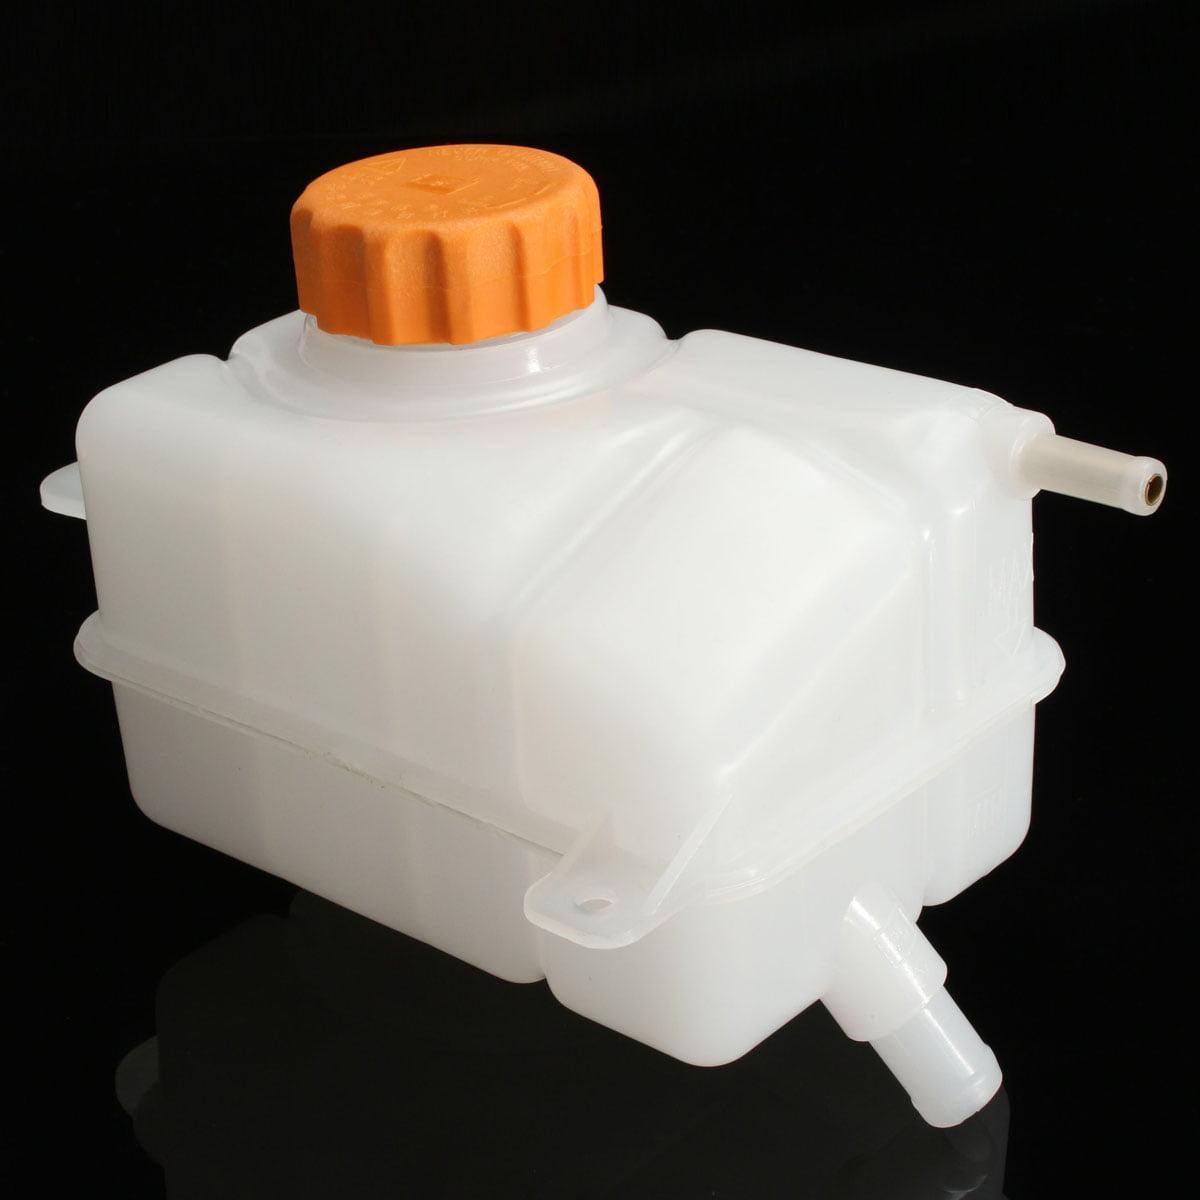 Cap Fit Chevy Chevrolet Aveo5 Aveo 1.6L 04-08 Coolant Reservoir Expansion Tank